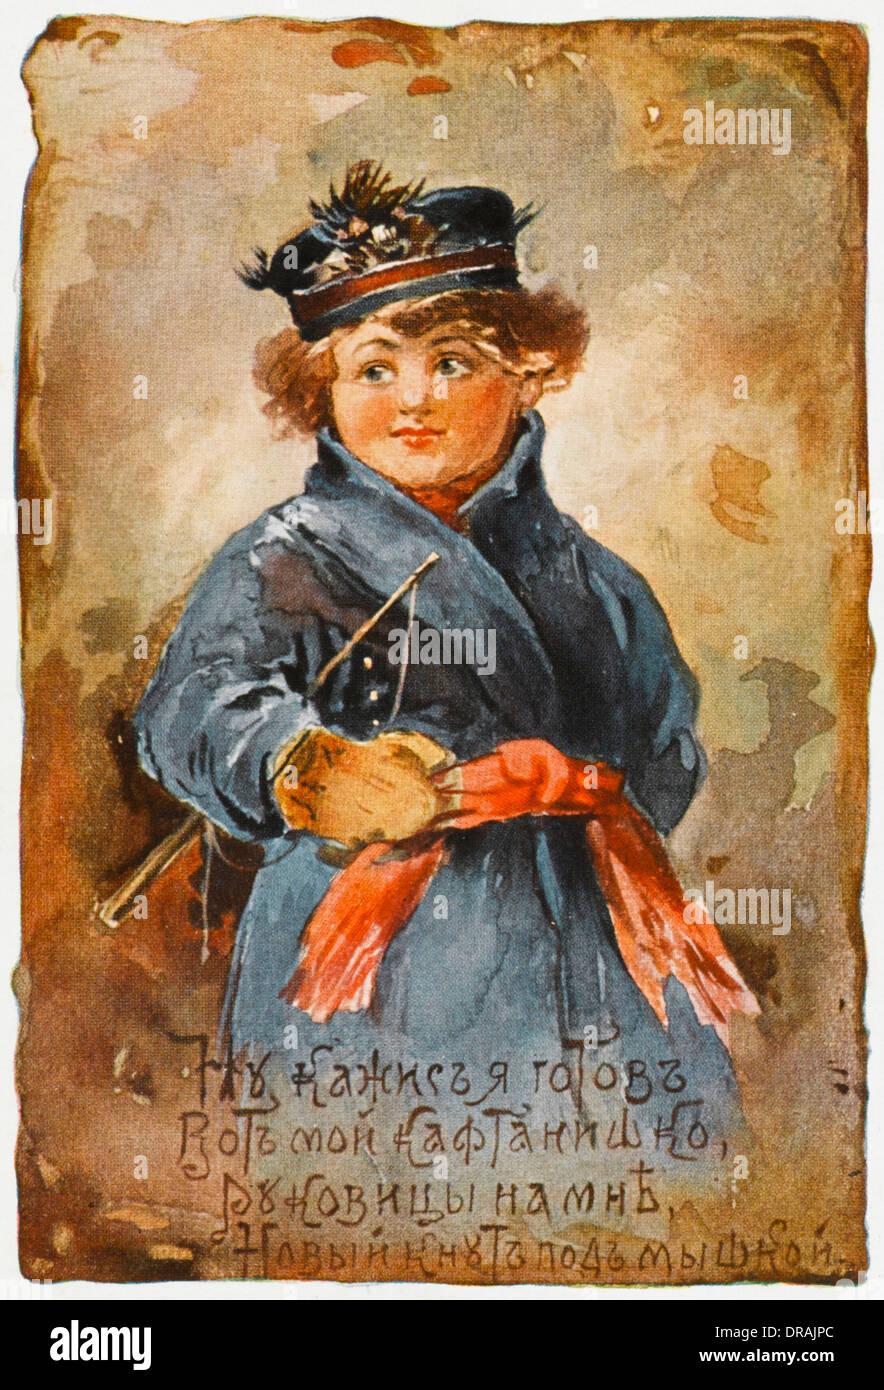 Little Russian coachman - Stock Image